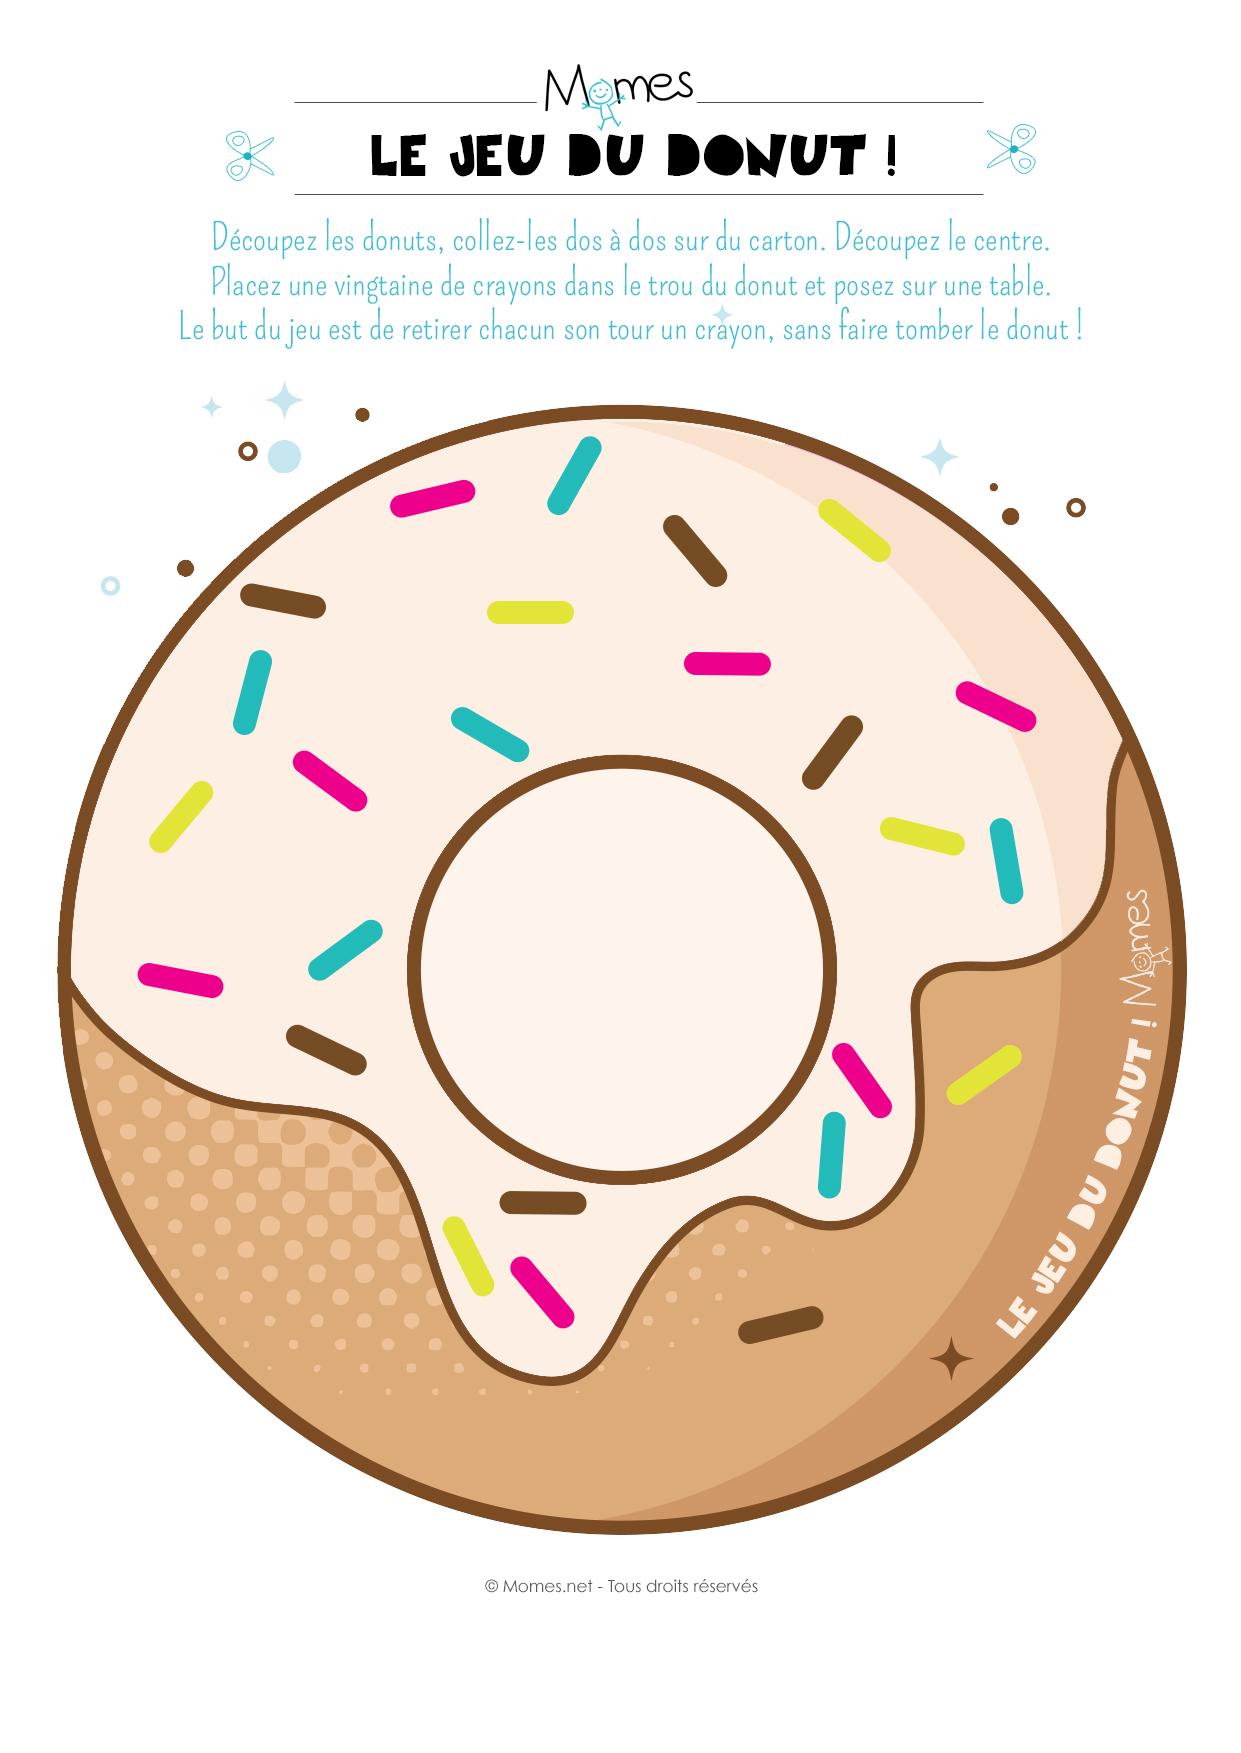 dessin de donut